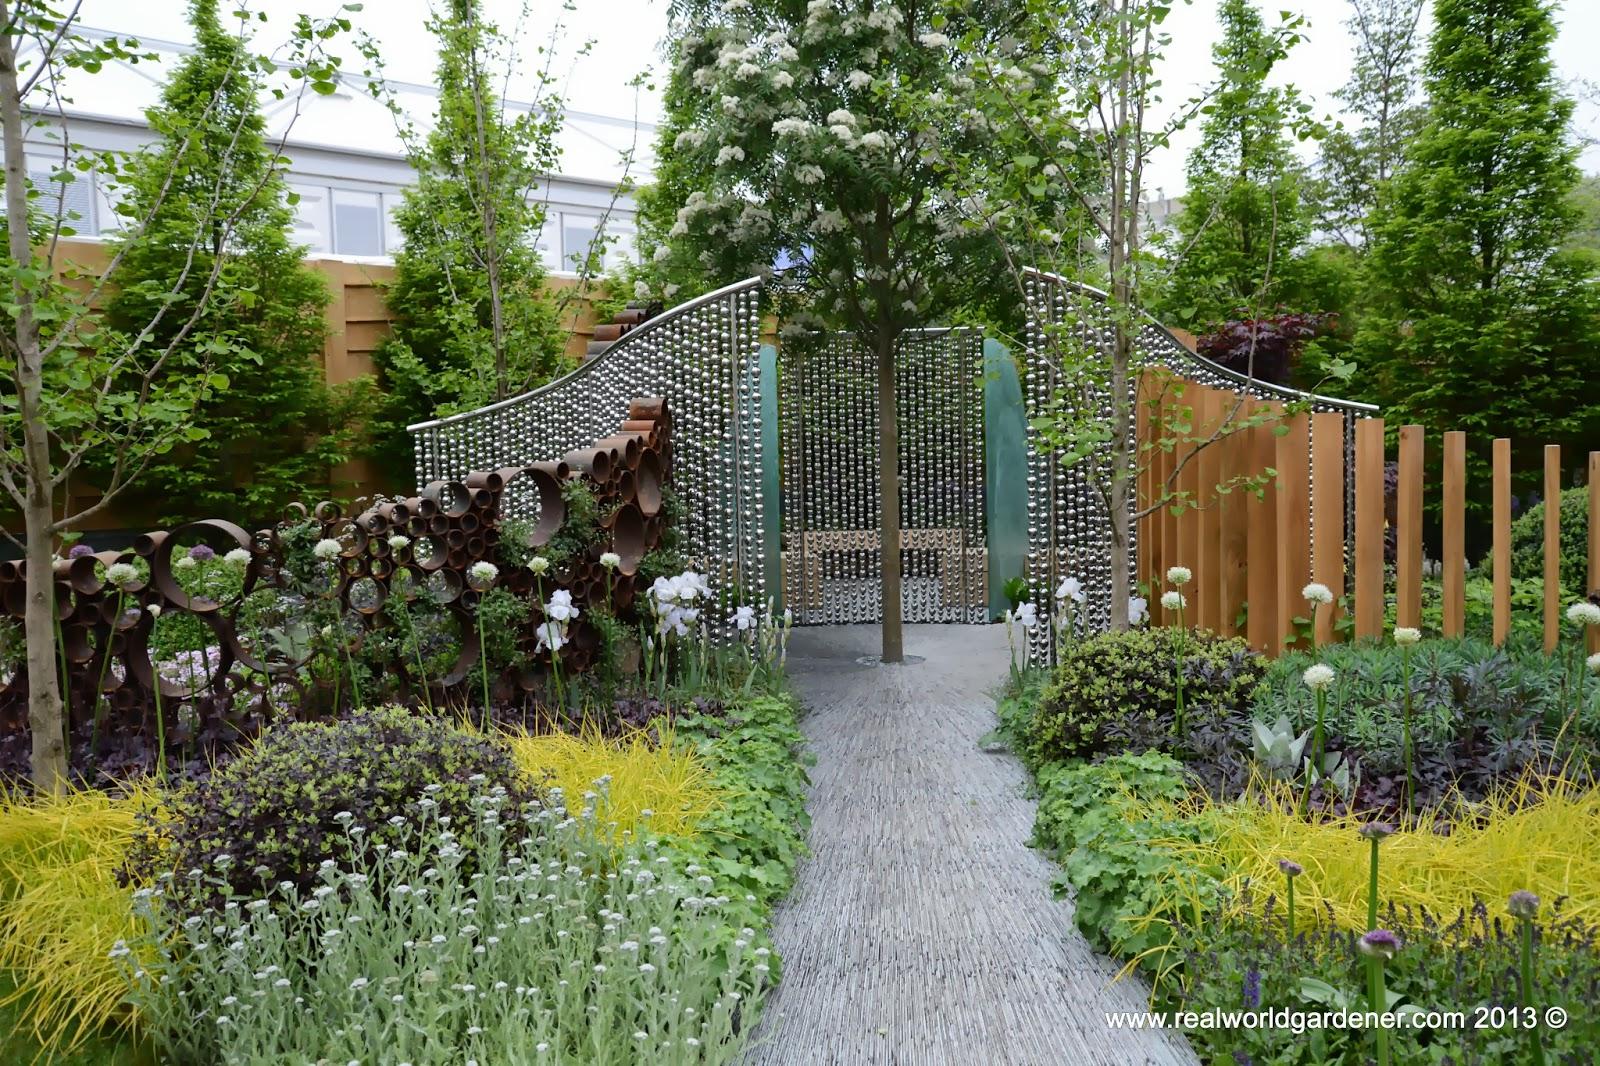 Real World Gardener Inspiration Seeability Garden in ...